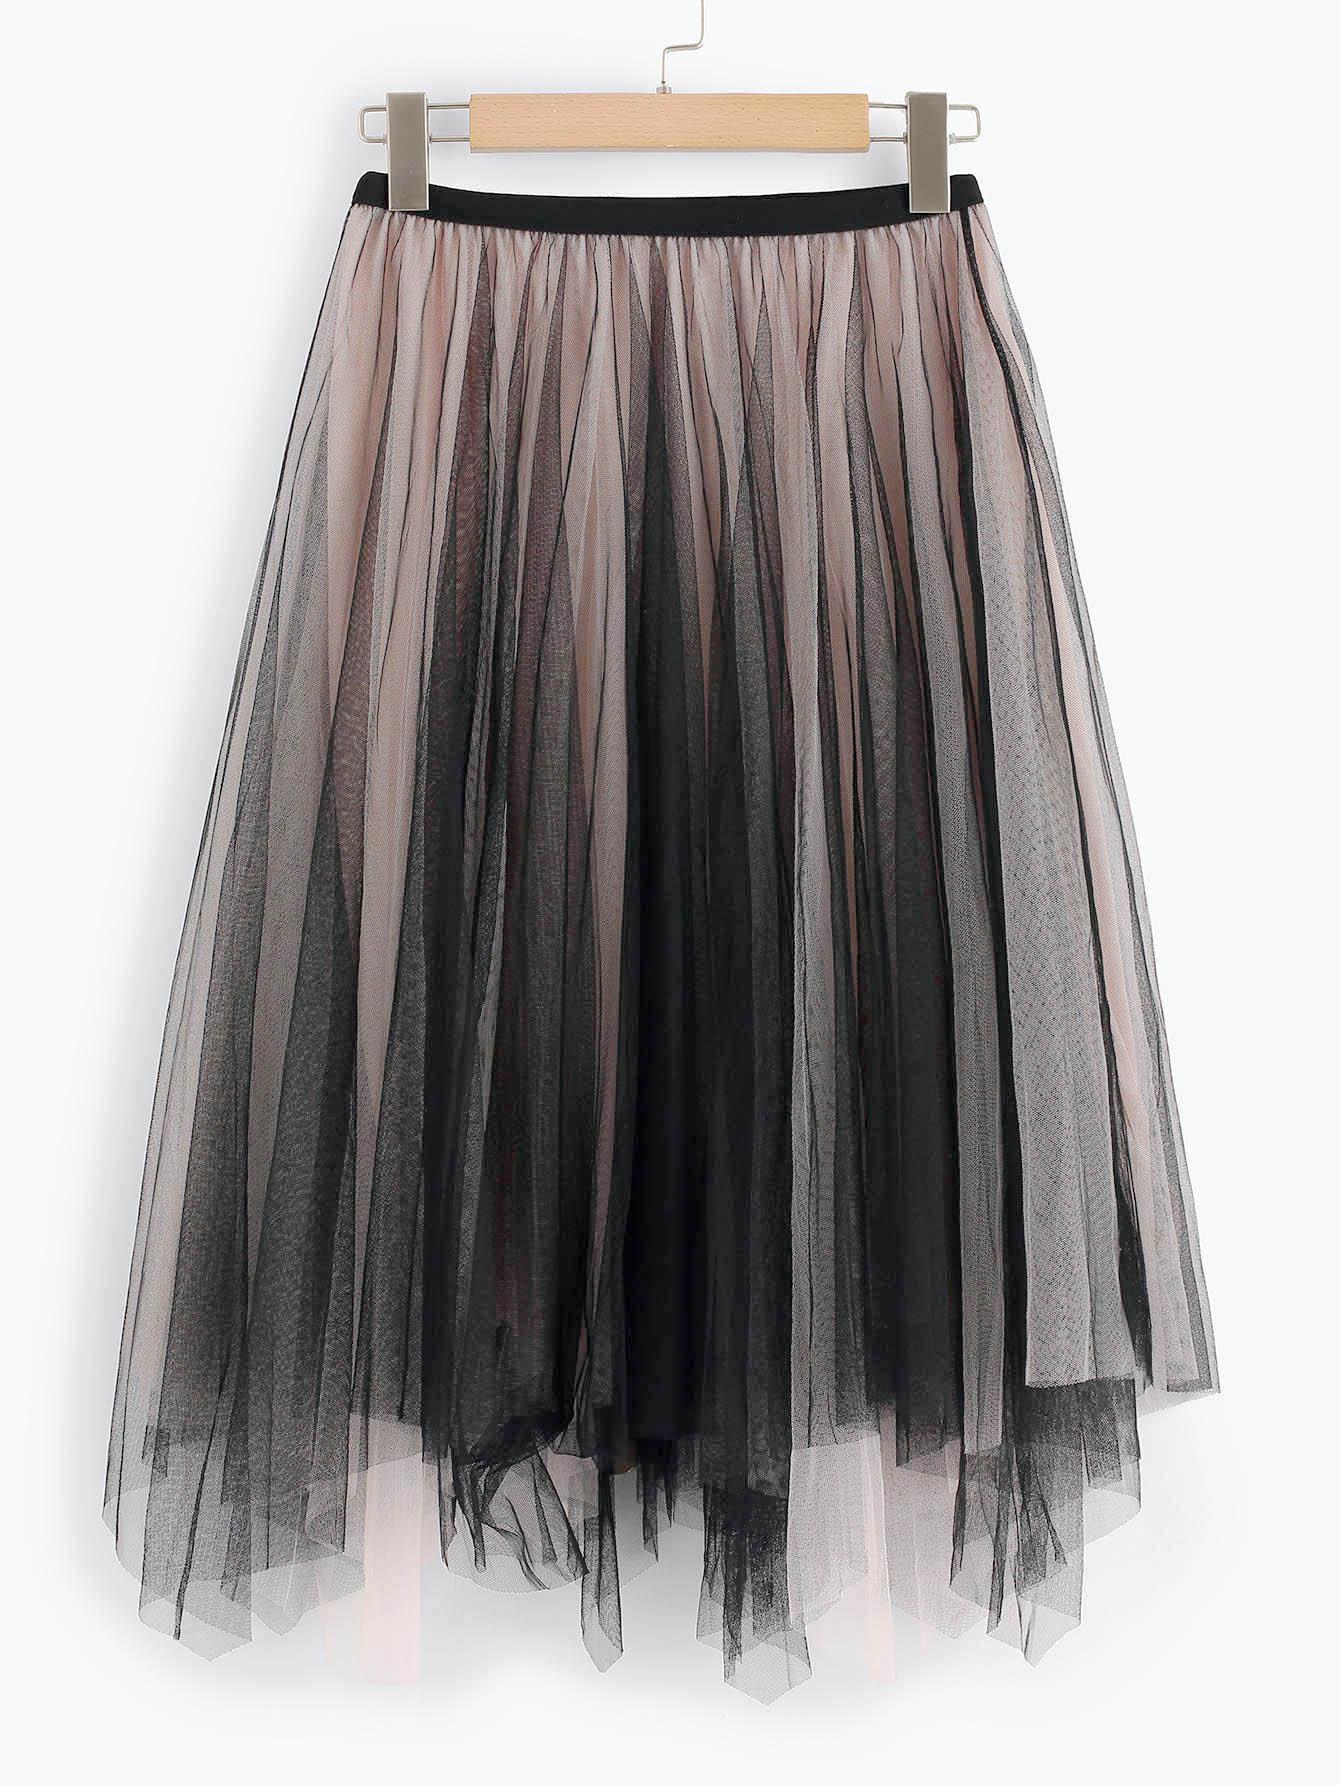 Купить Ассиметричная юбка, null, SheIn